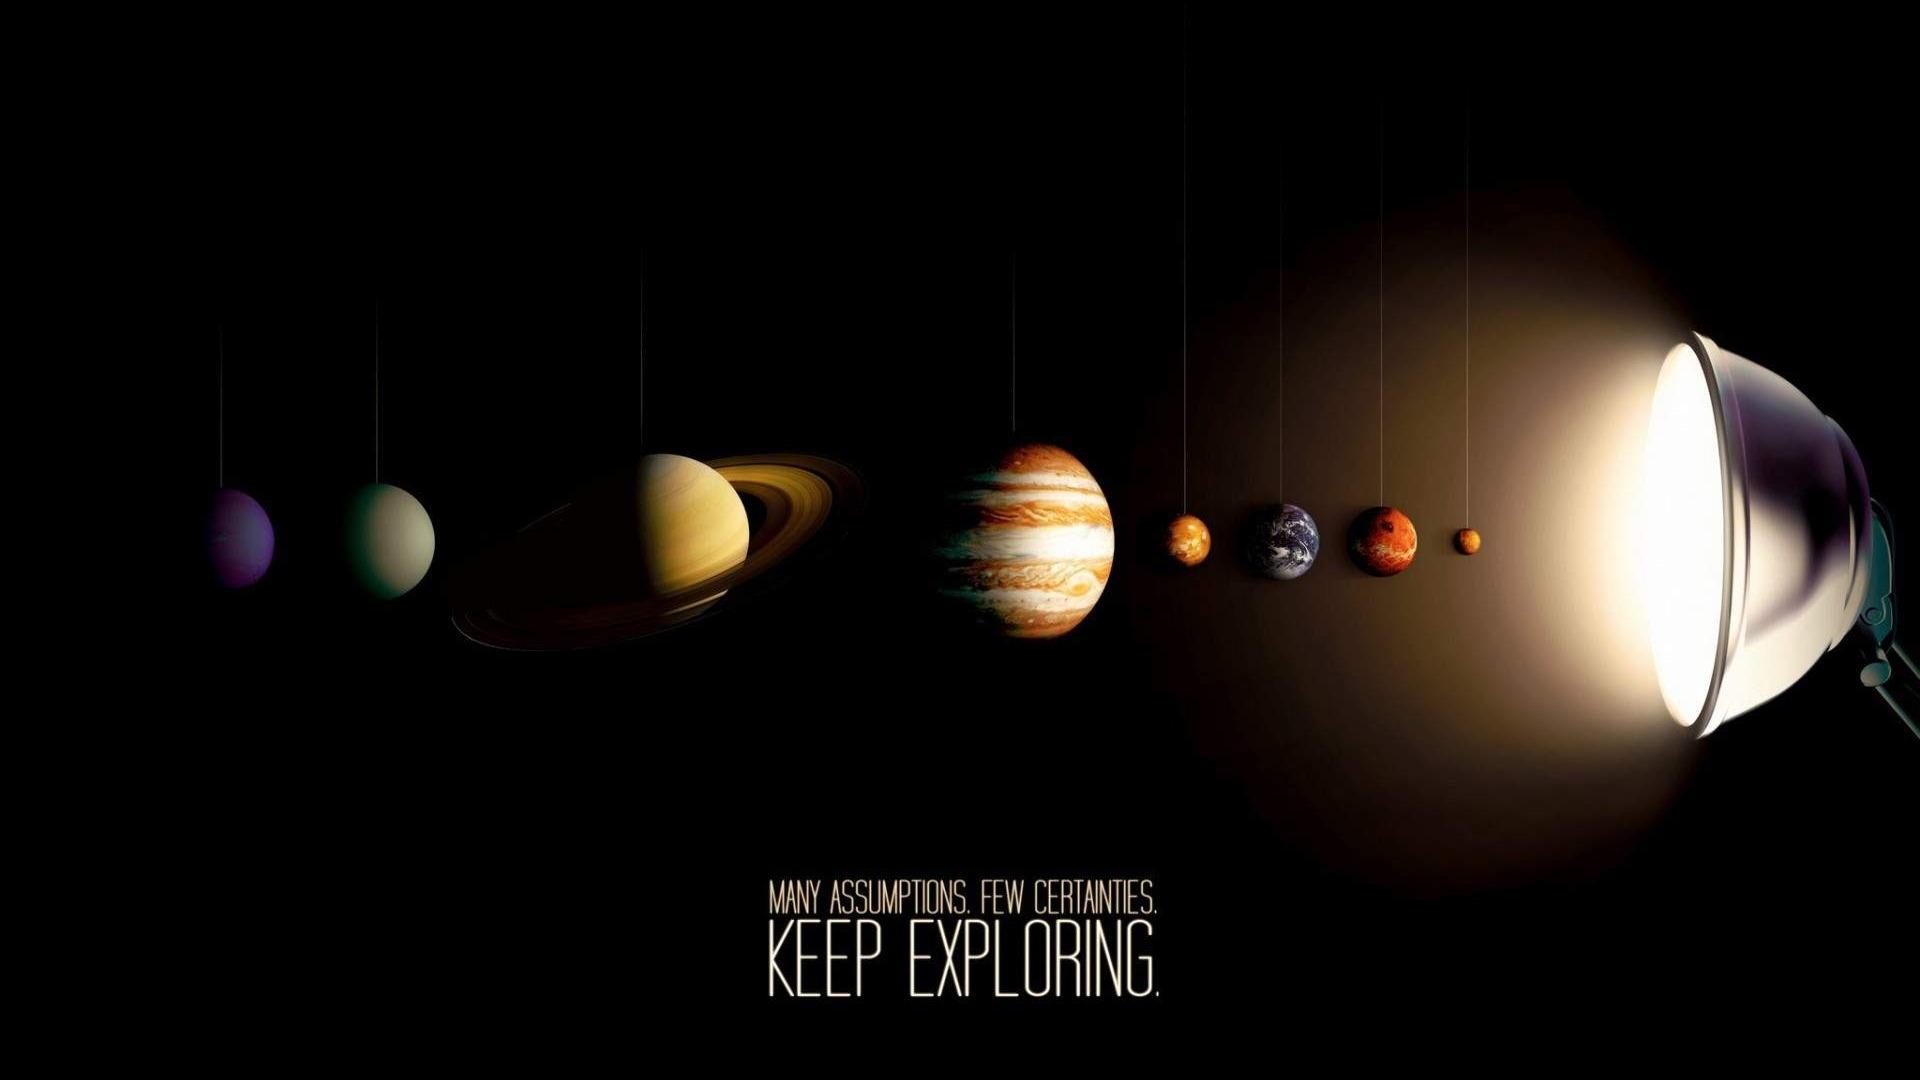 Solar System Universe Space Hd Desktop Wallpaper Preview